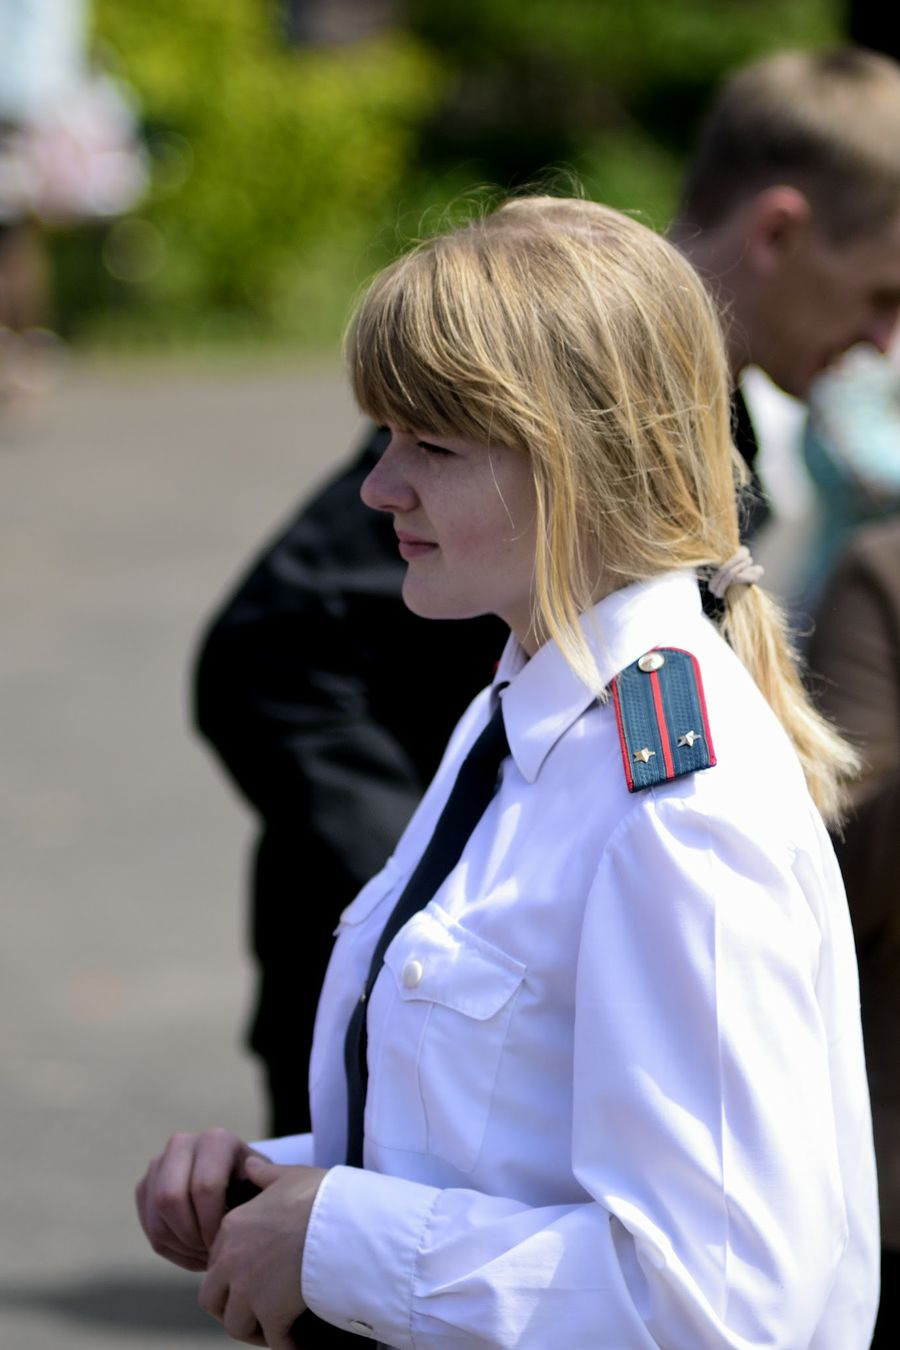 Russia репортаж Portret Girl девушка Sexy Girl Police